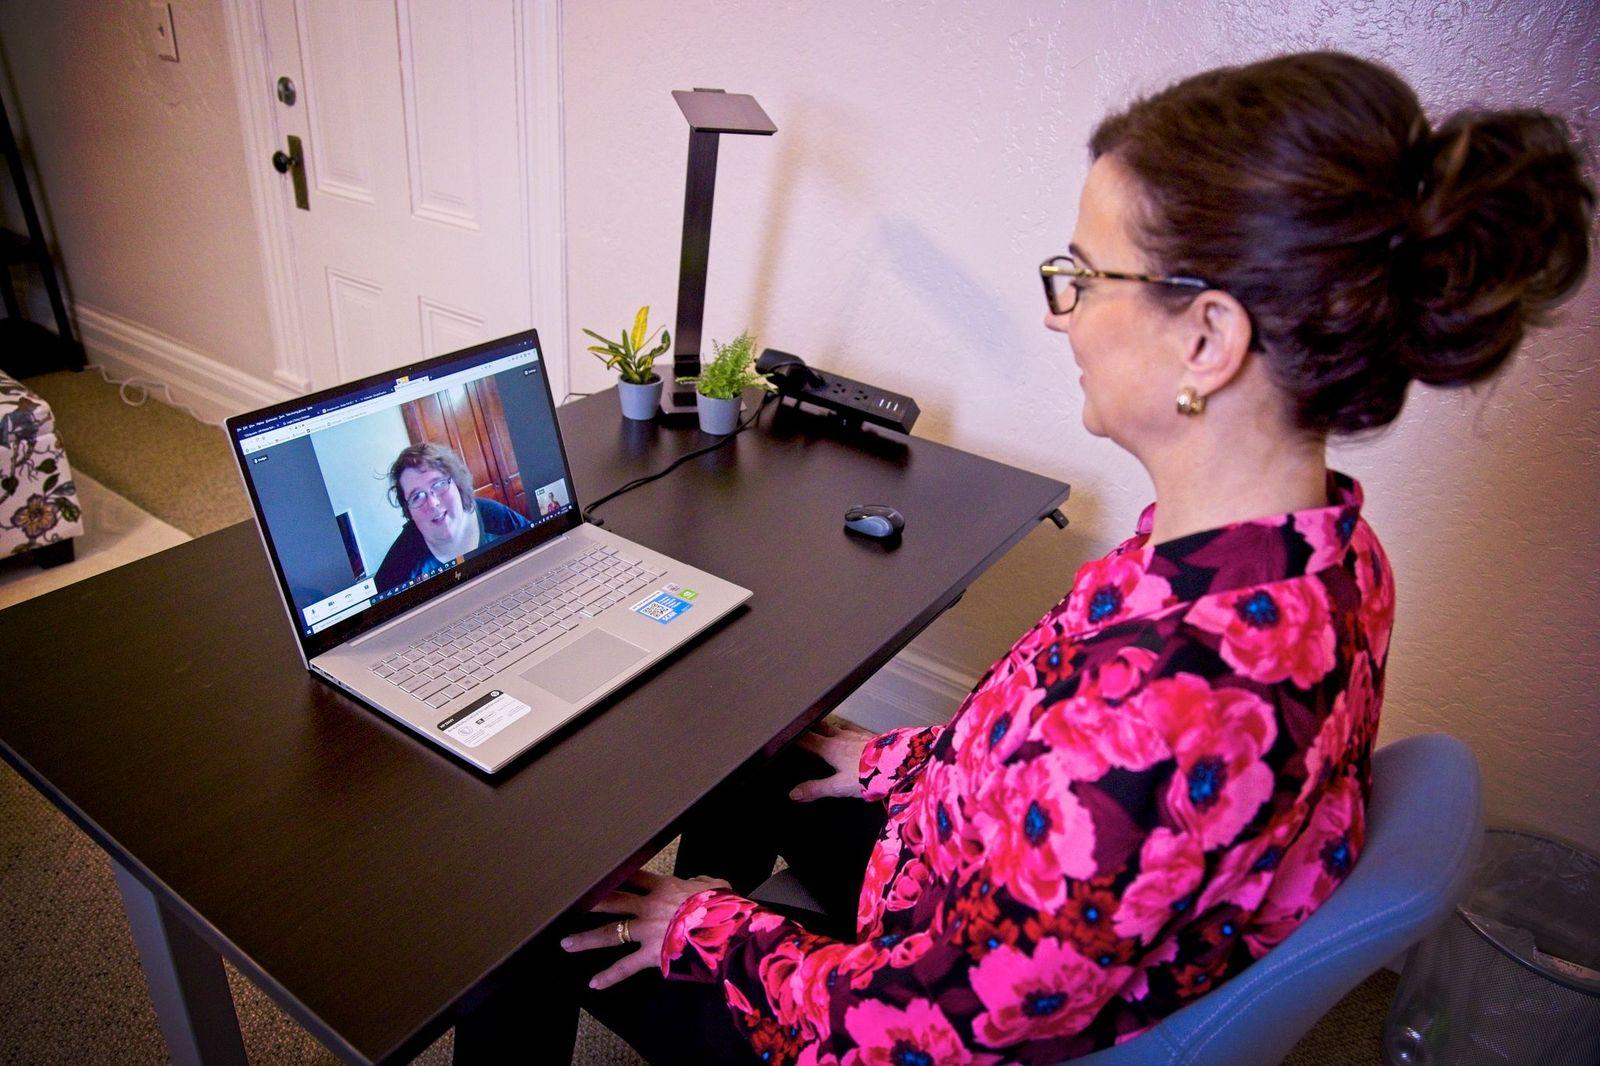 Mary Ellen Banevedas provides remote telehealth services